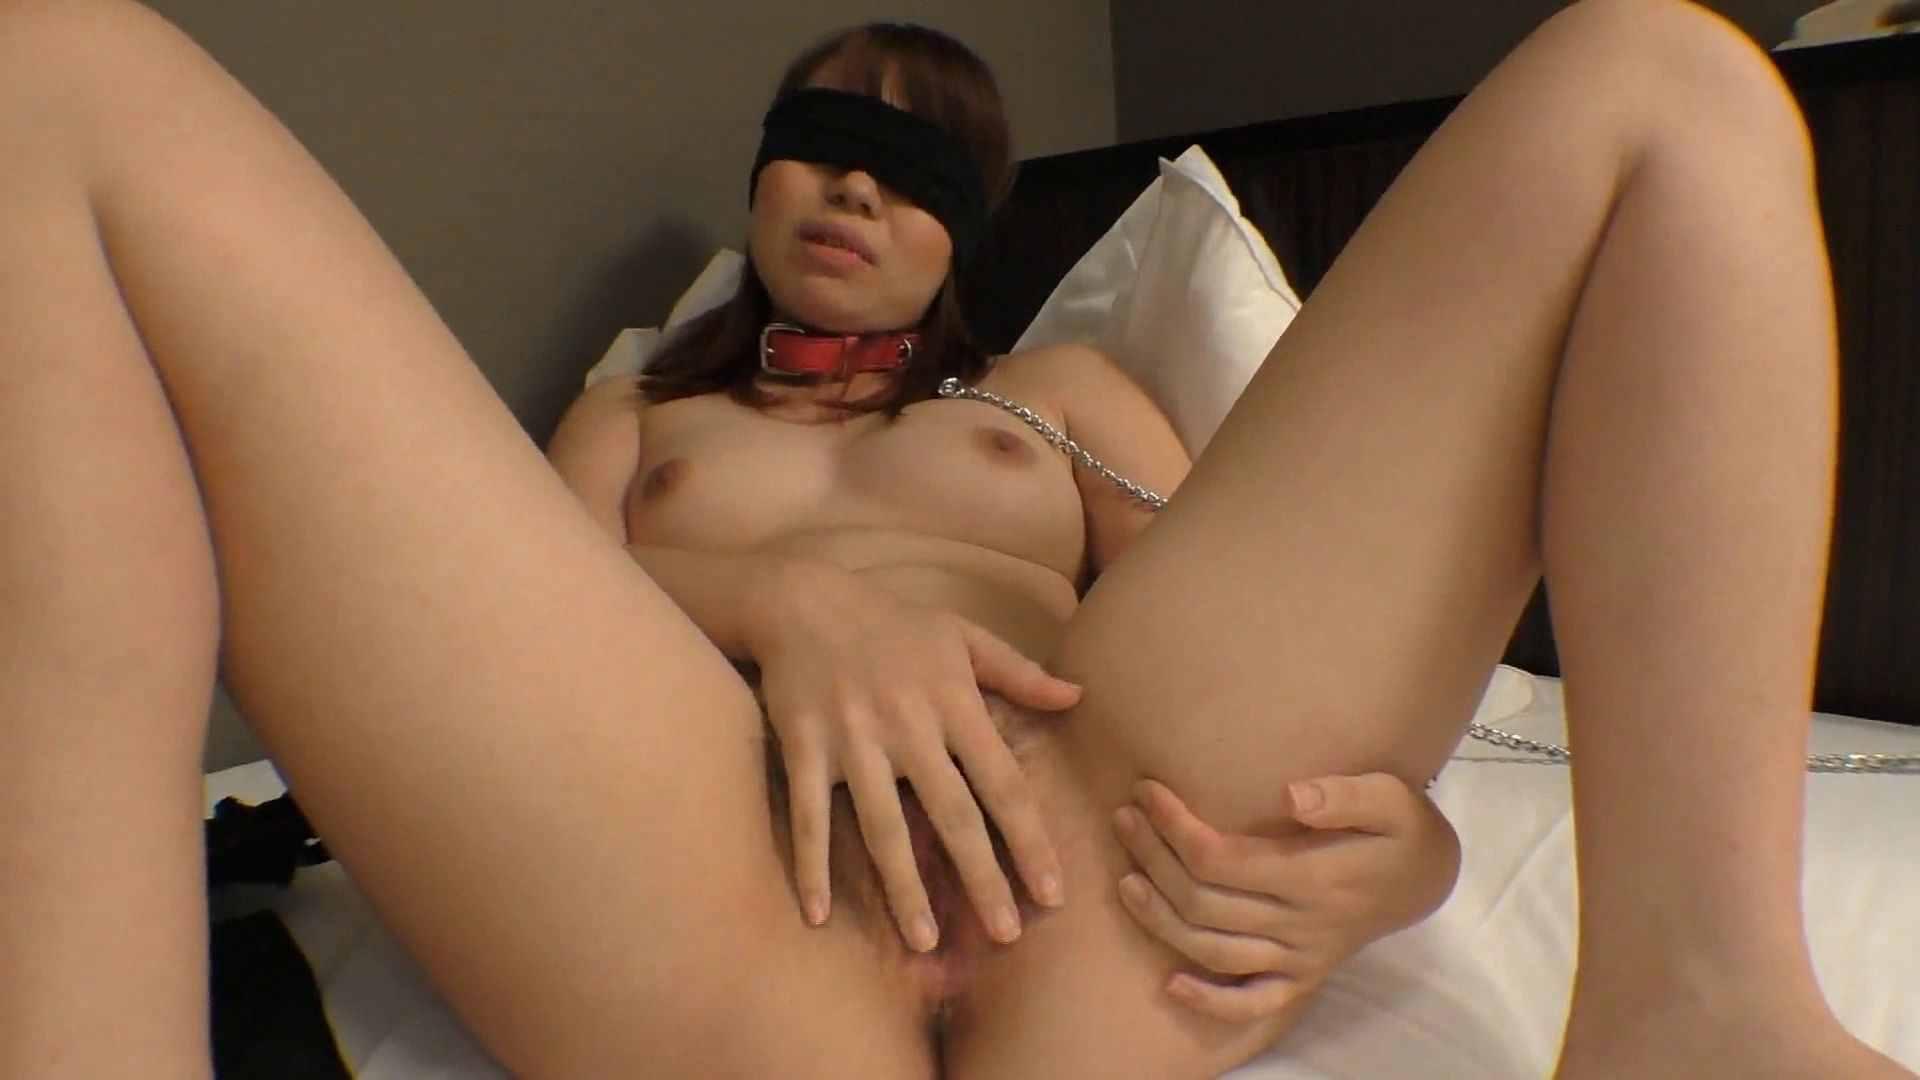 S級厳選美女ビッチガールVol.09 美少女ヌード 性交動画流出 102画像 62